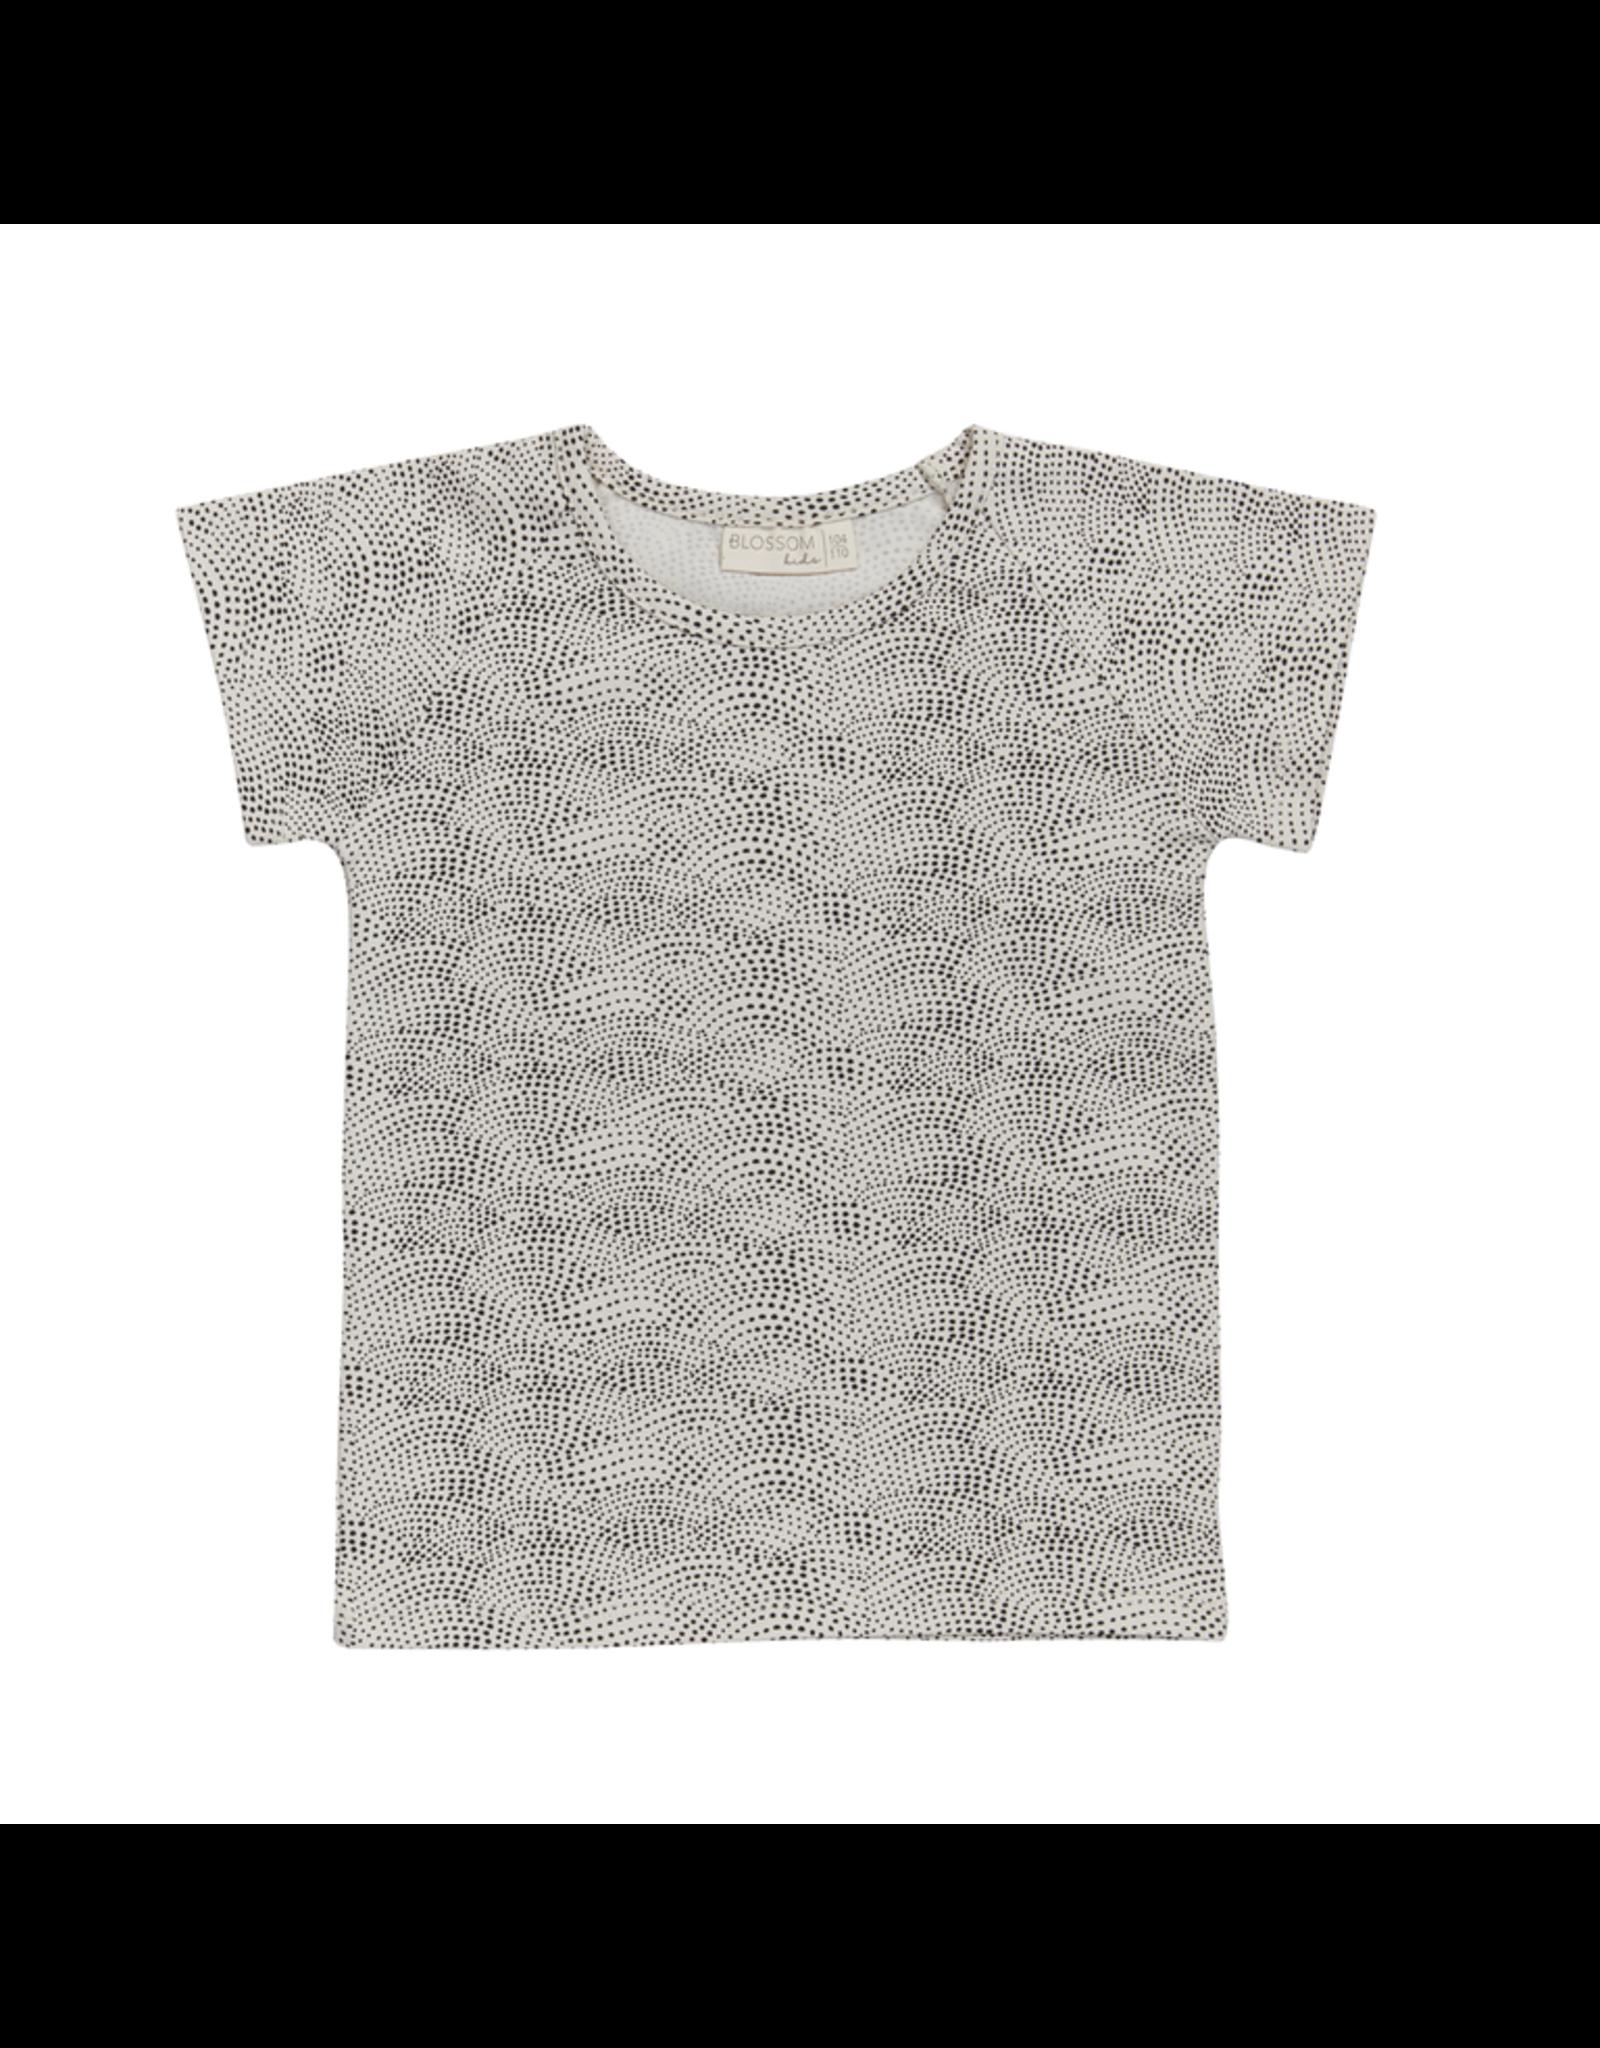 Blossom Kids Blossom Kids - Raglan short sleeve shirt - Dotted Waves